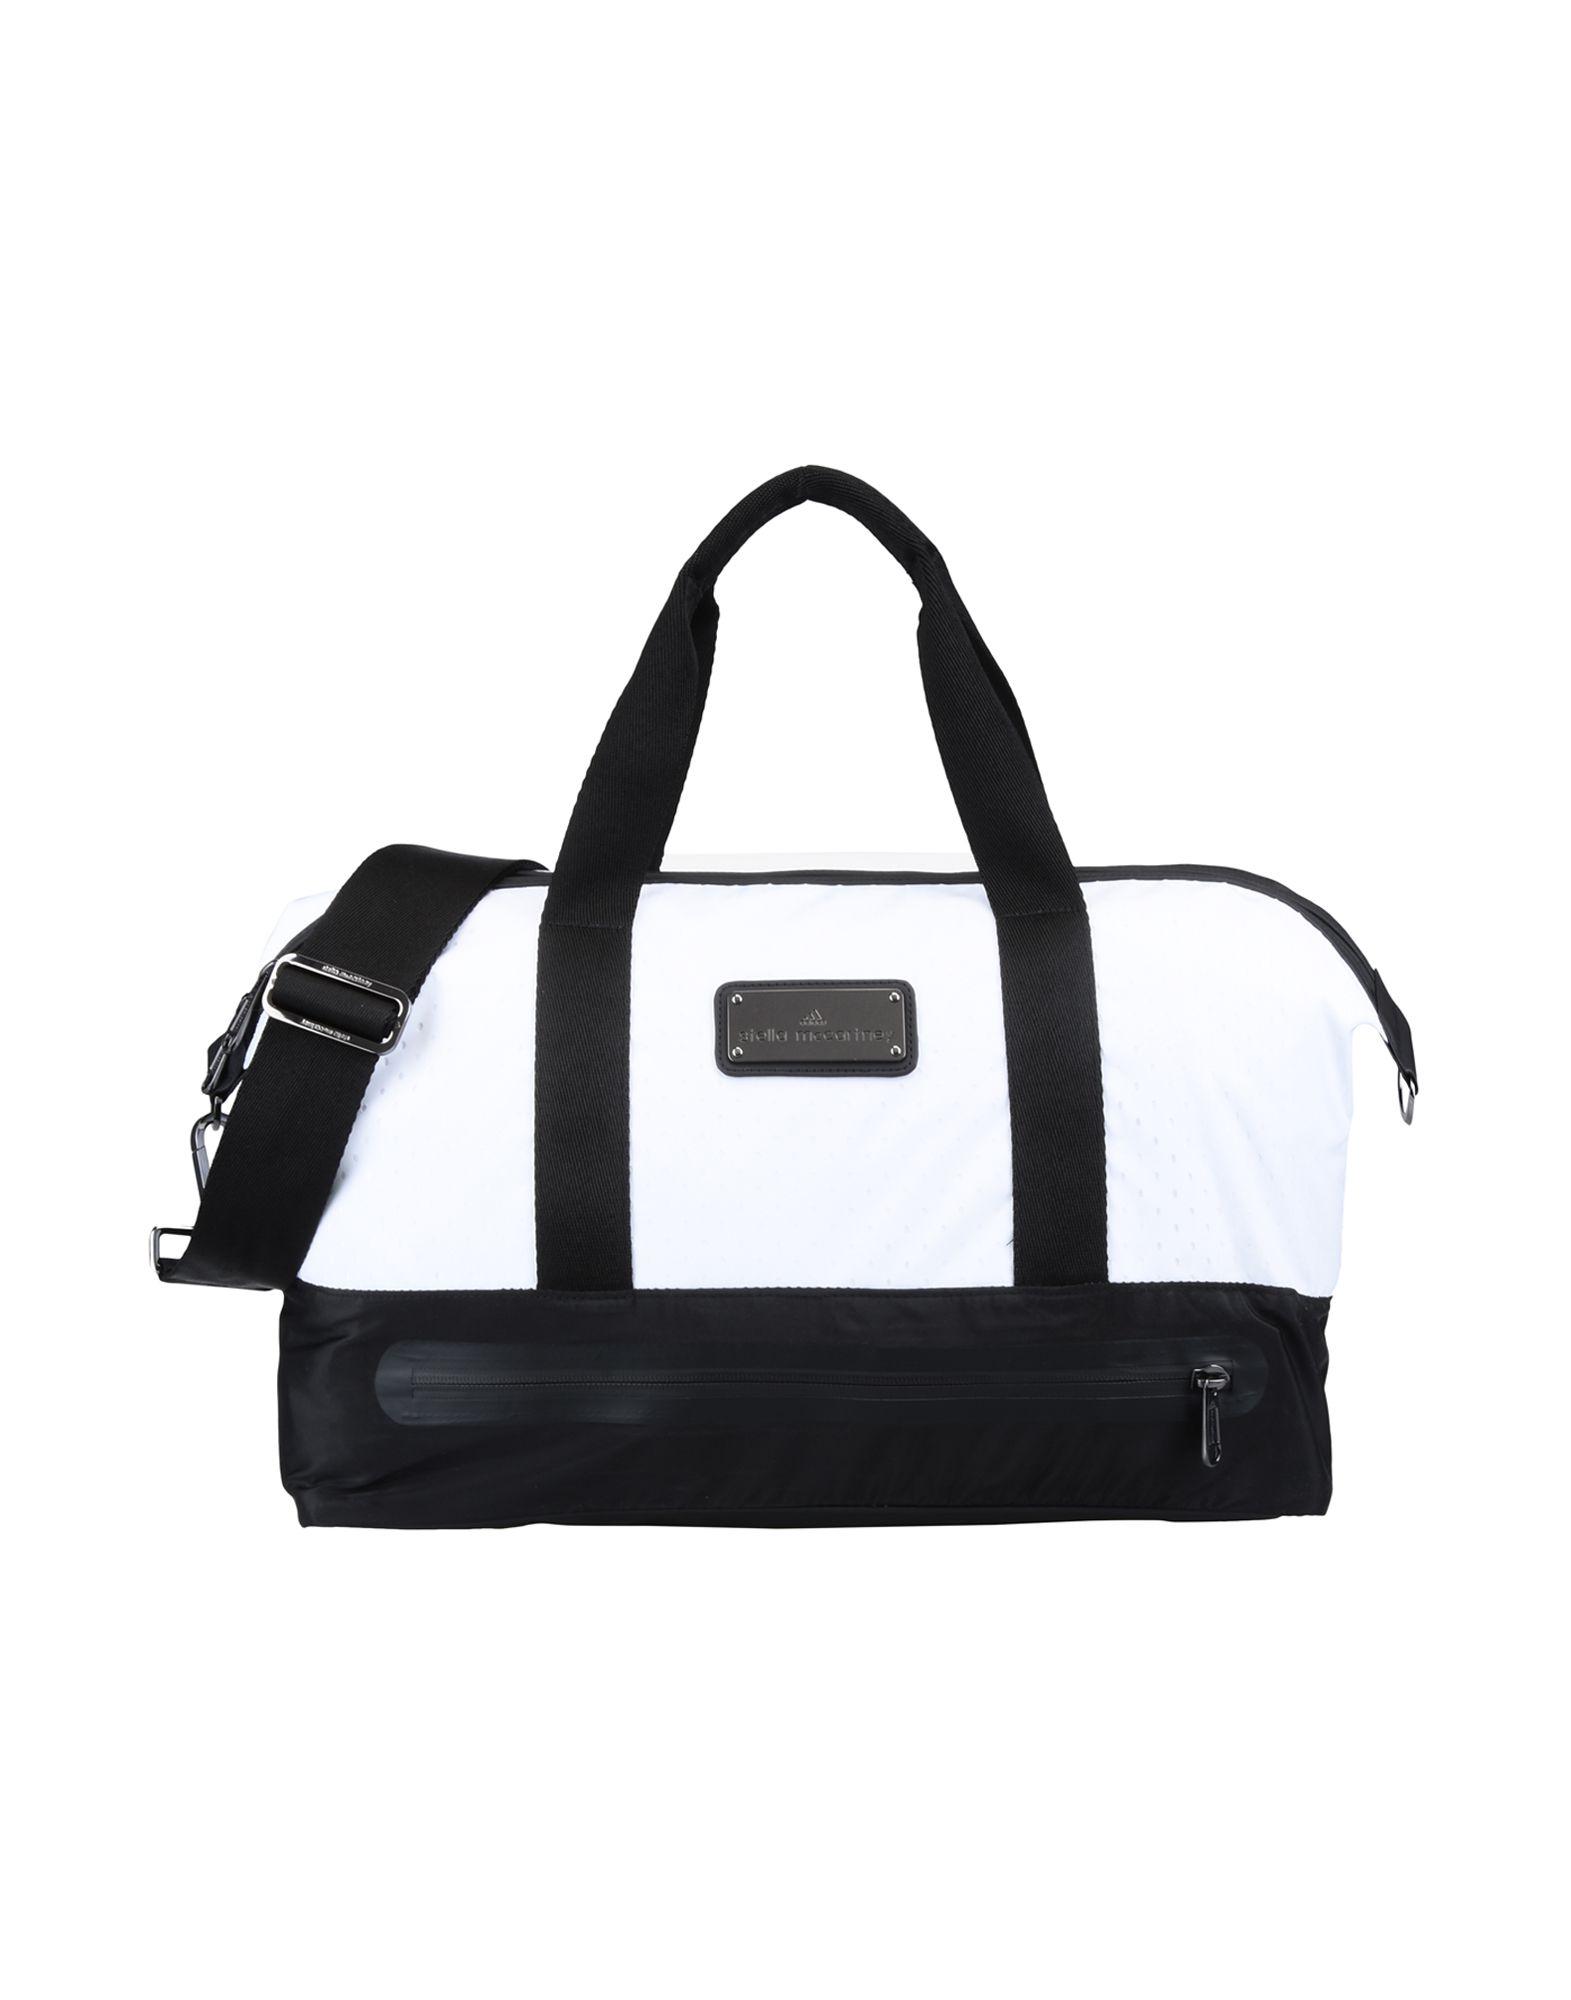 Buy adidas small gym bag   OFF47% Discounted 73ec2b2d7c